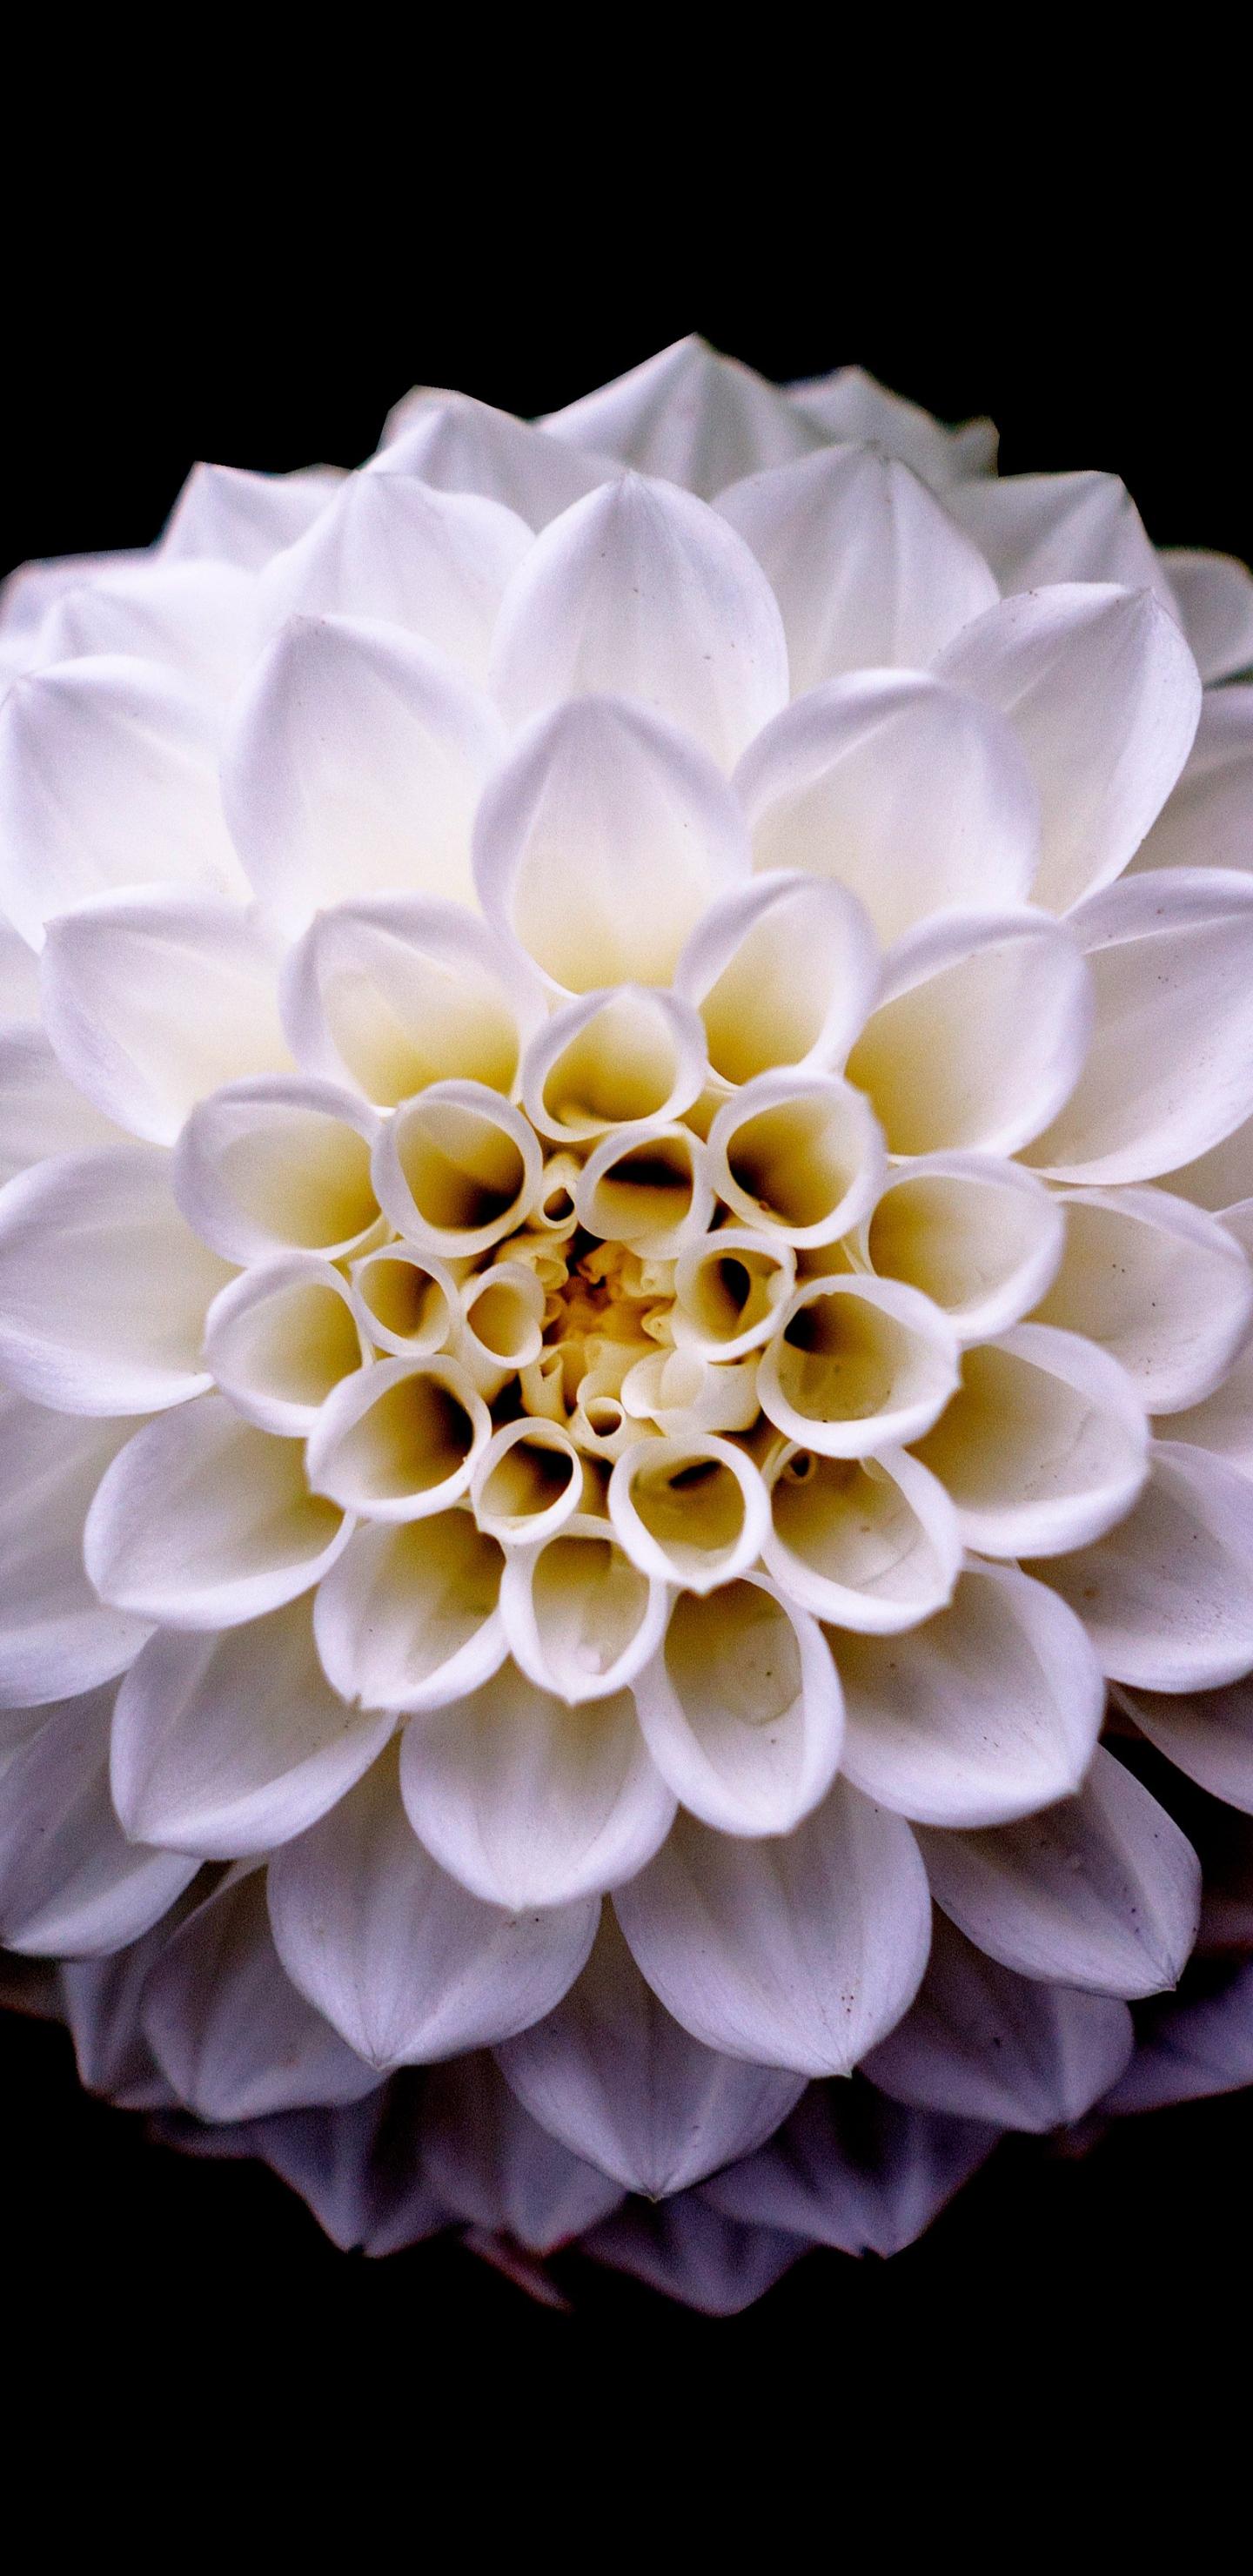 Dahlia, flower, portrait, 1440x2960 wallpaper